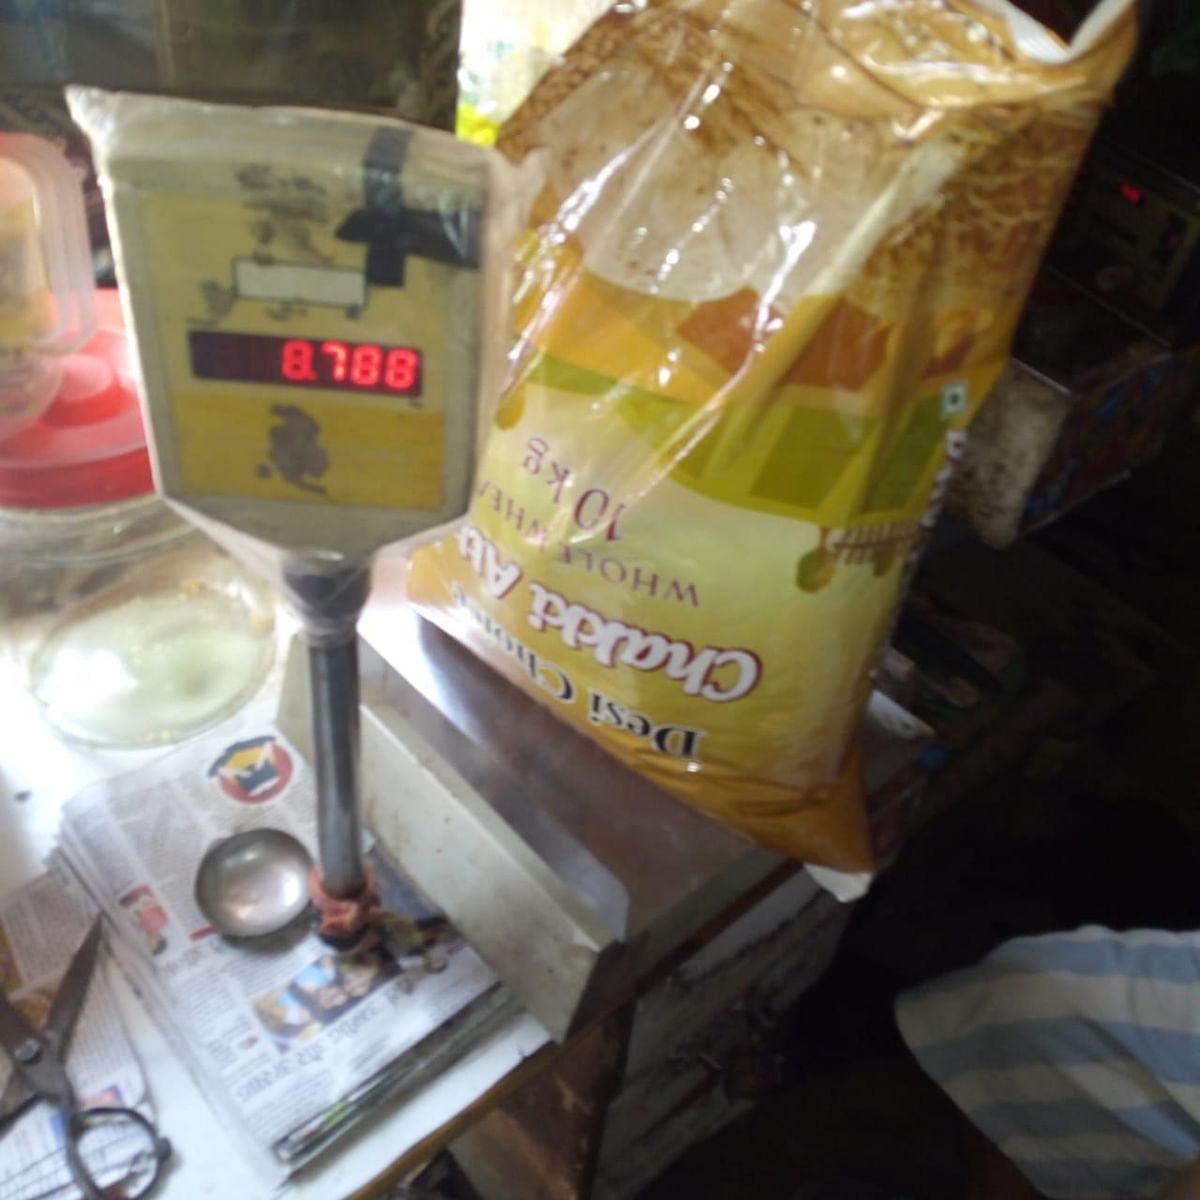 Underweight flour packets distributed in MP: Congress alleges ₹60 crore 'atta scam', demands probe